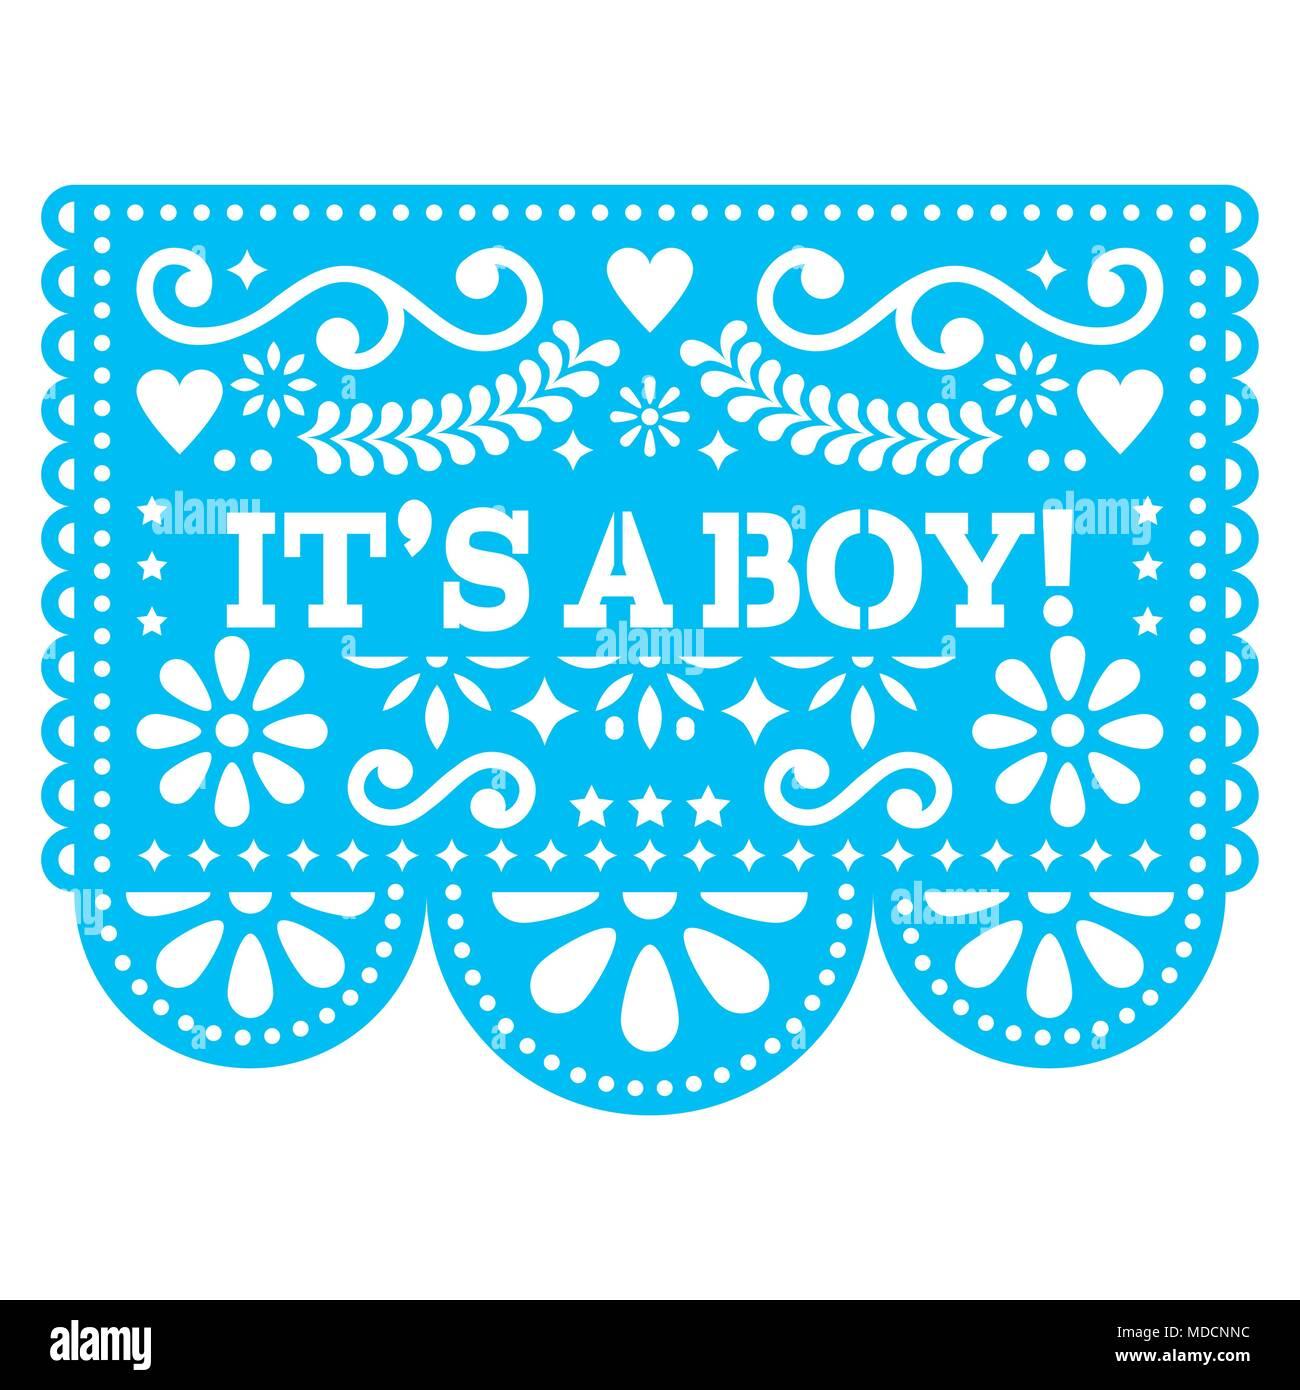 Its A Boy Papel Picado Vector Design Mexican Folk Art Baby Birth